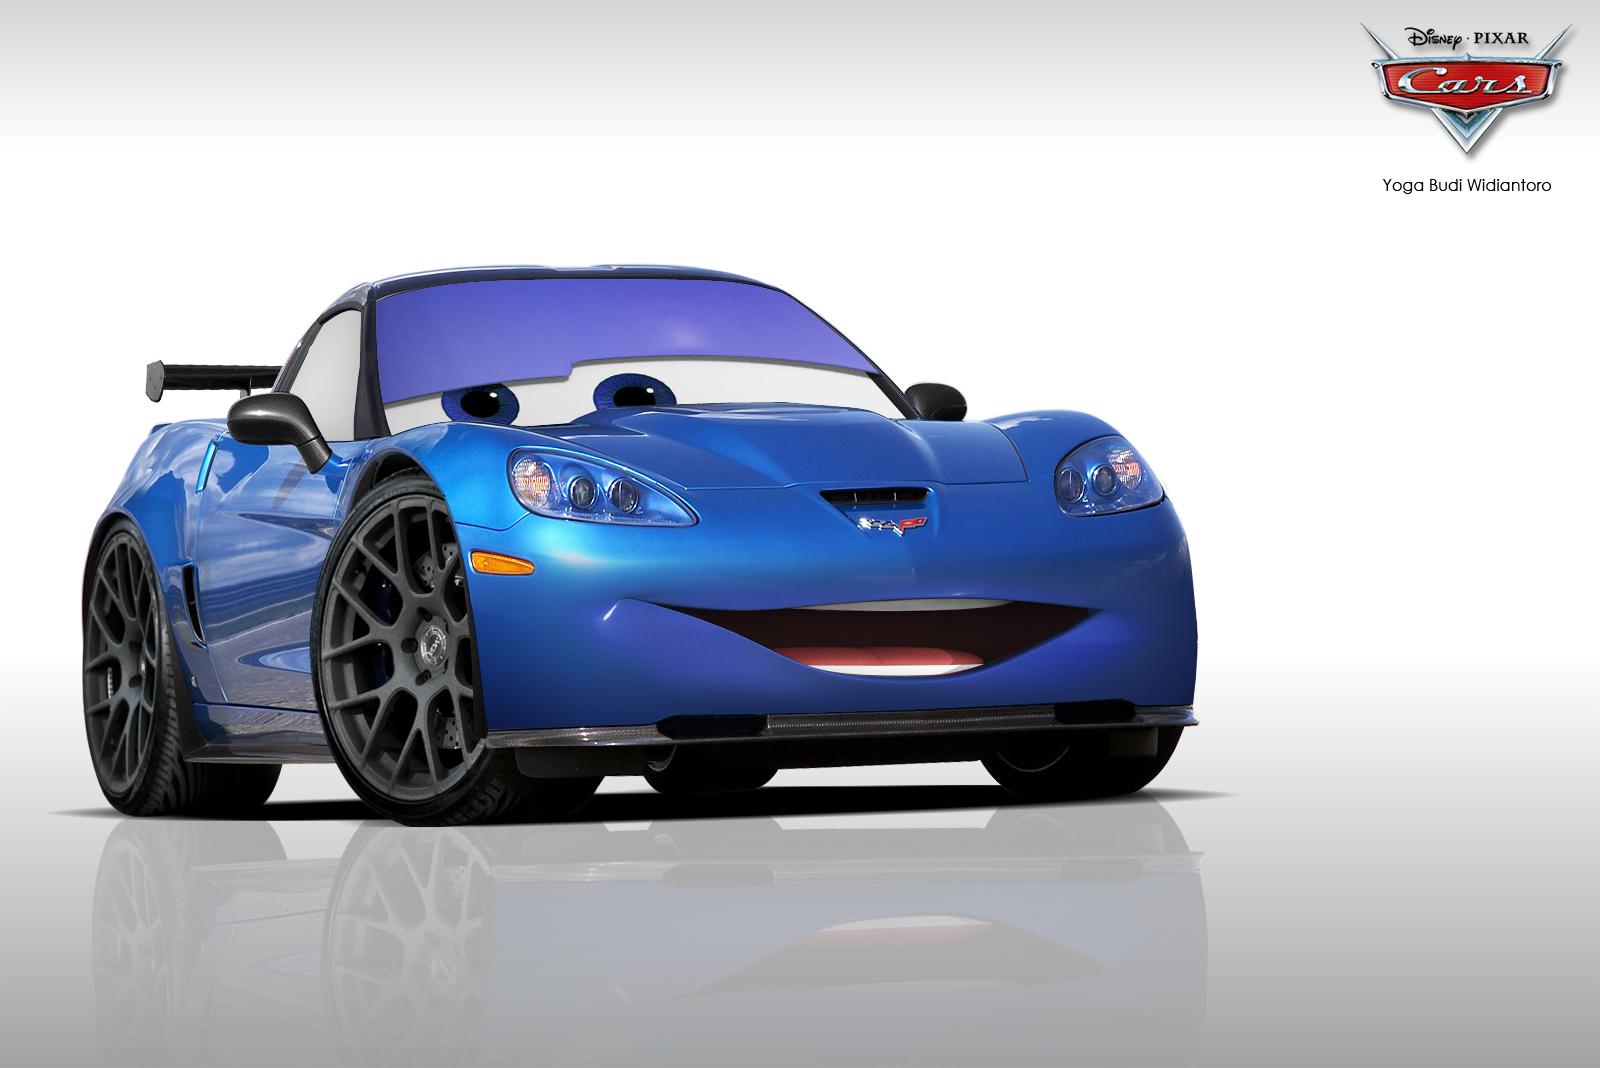 Cars Chevrolet Corvette Zr1 Racing Kit By